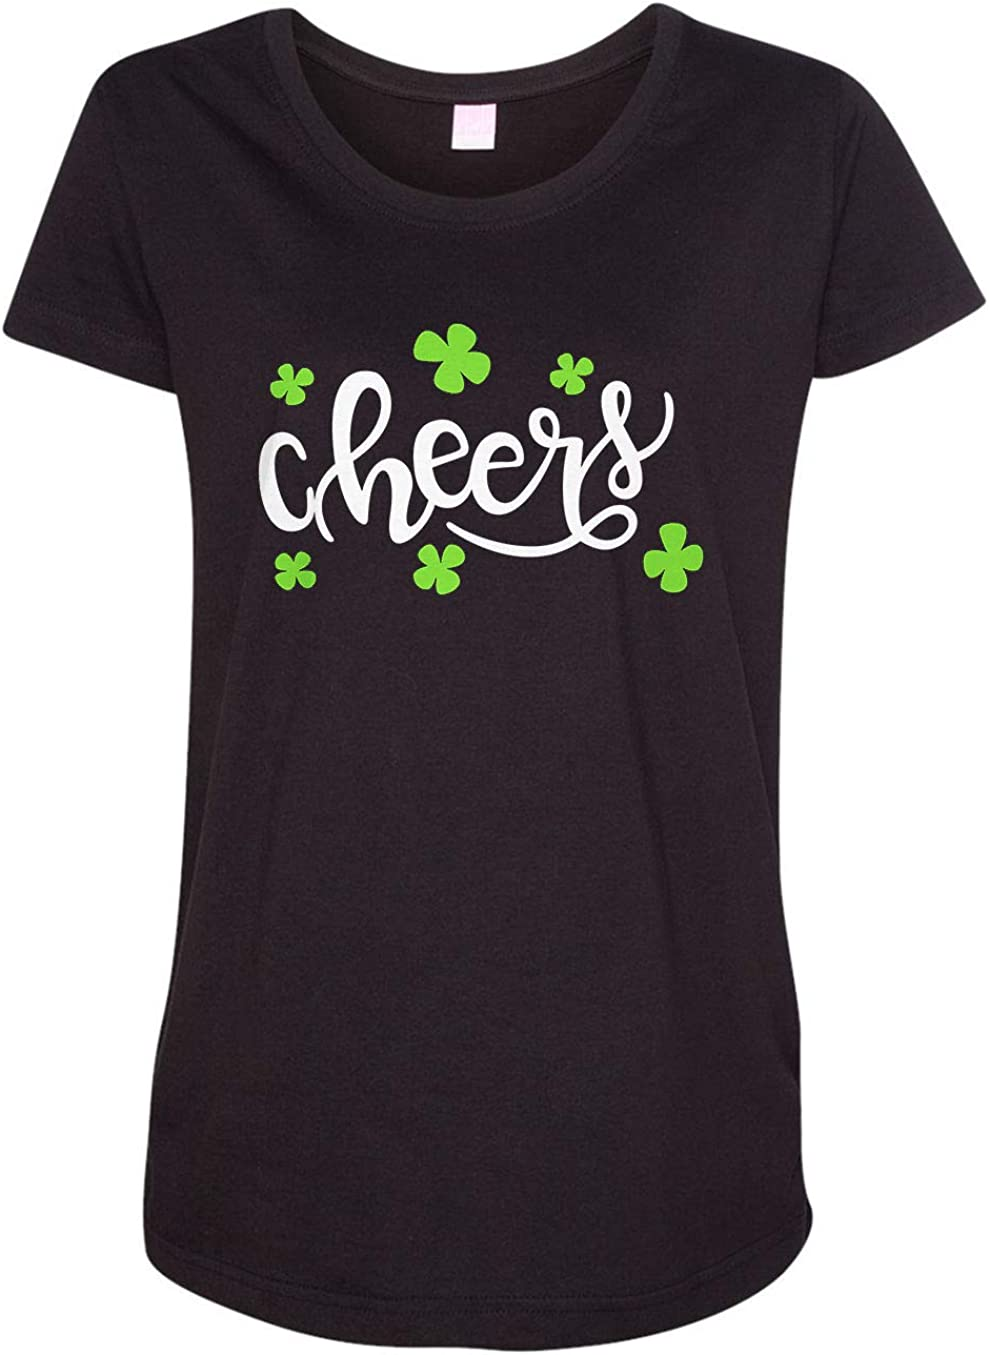 HARD EDGE DESIGN Women's St. Patty's Day Cheers Clover T-Shirt